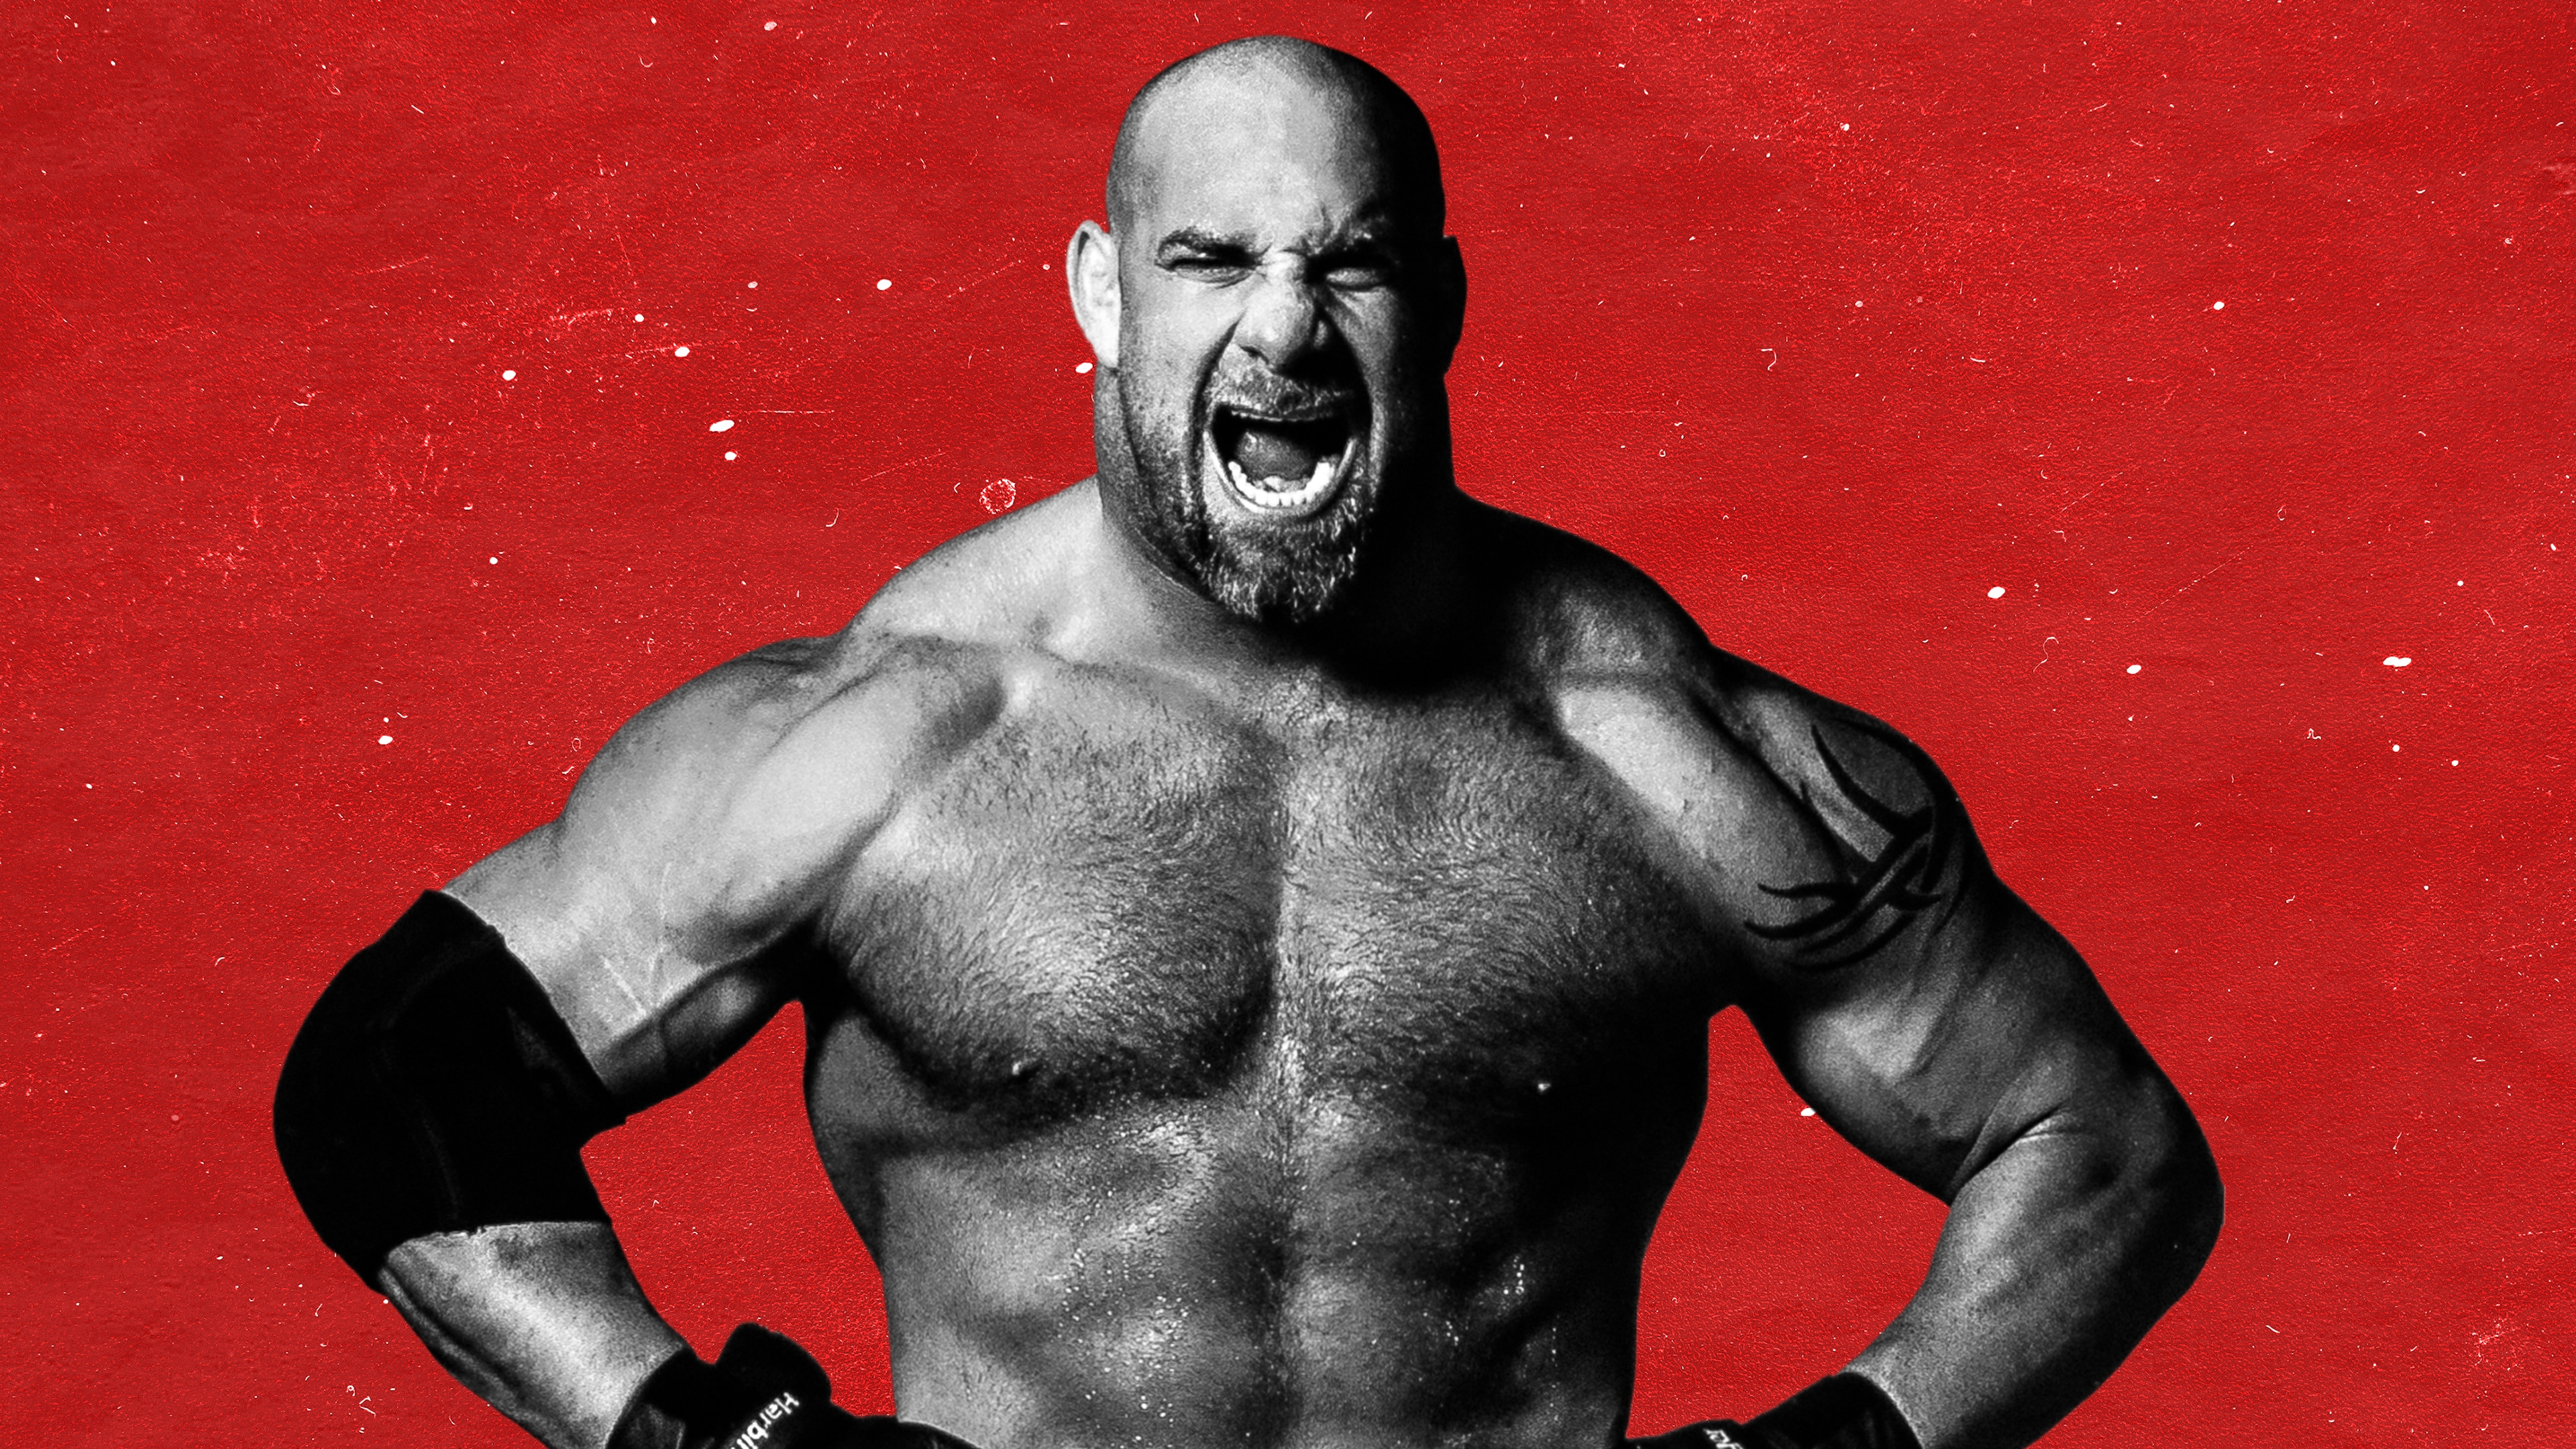 Goldberg's Streak